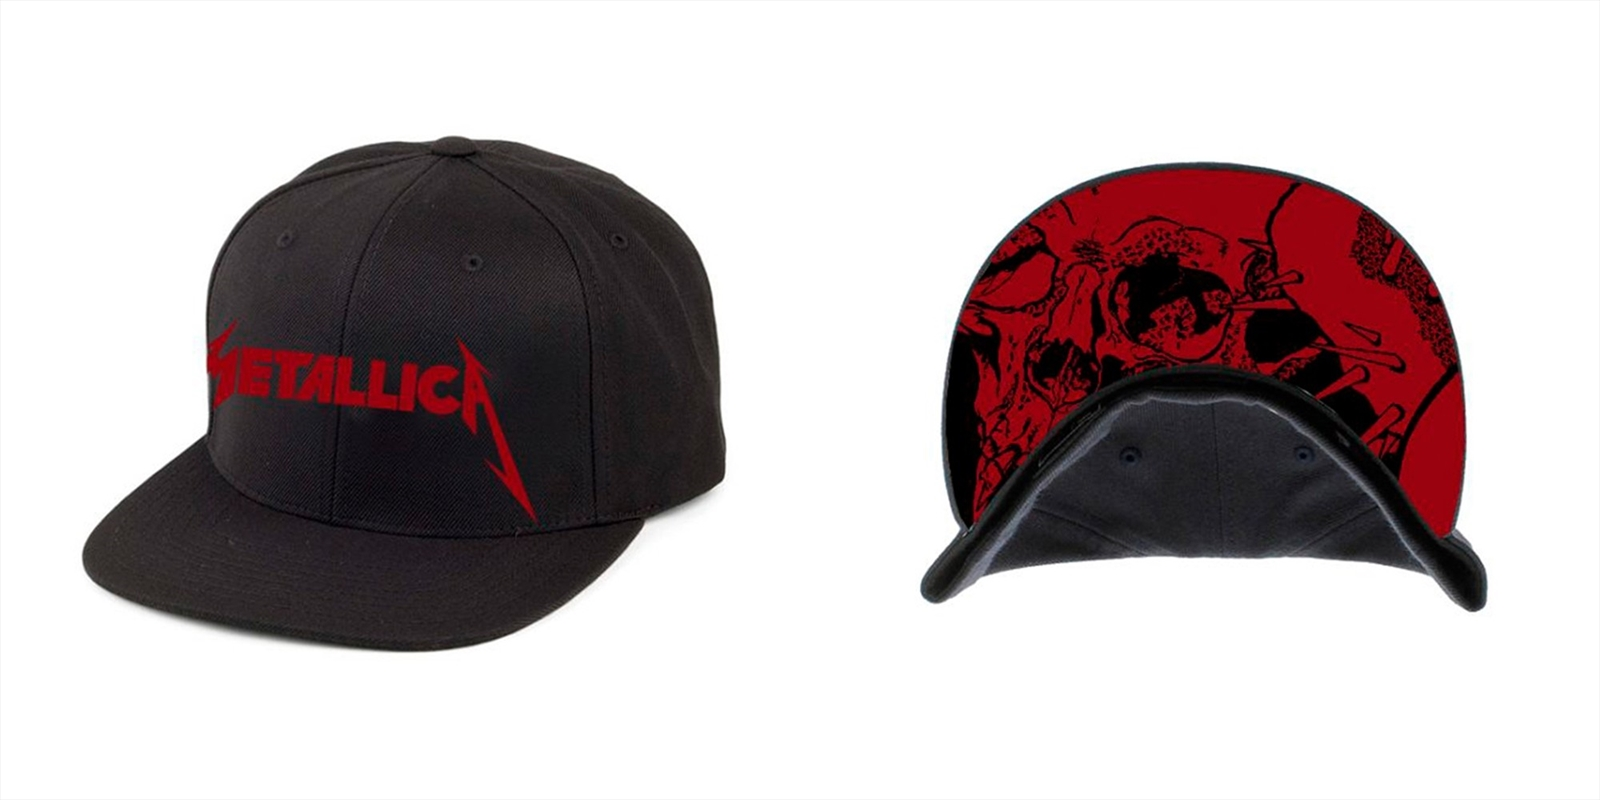 Metallica Red Damage Inc: Snapback Hat | Apparel